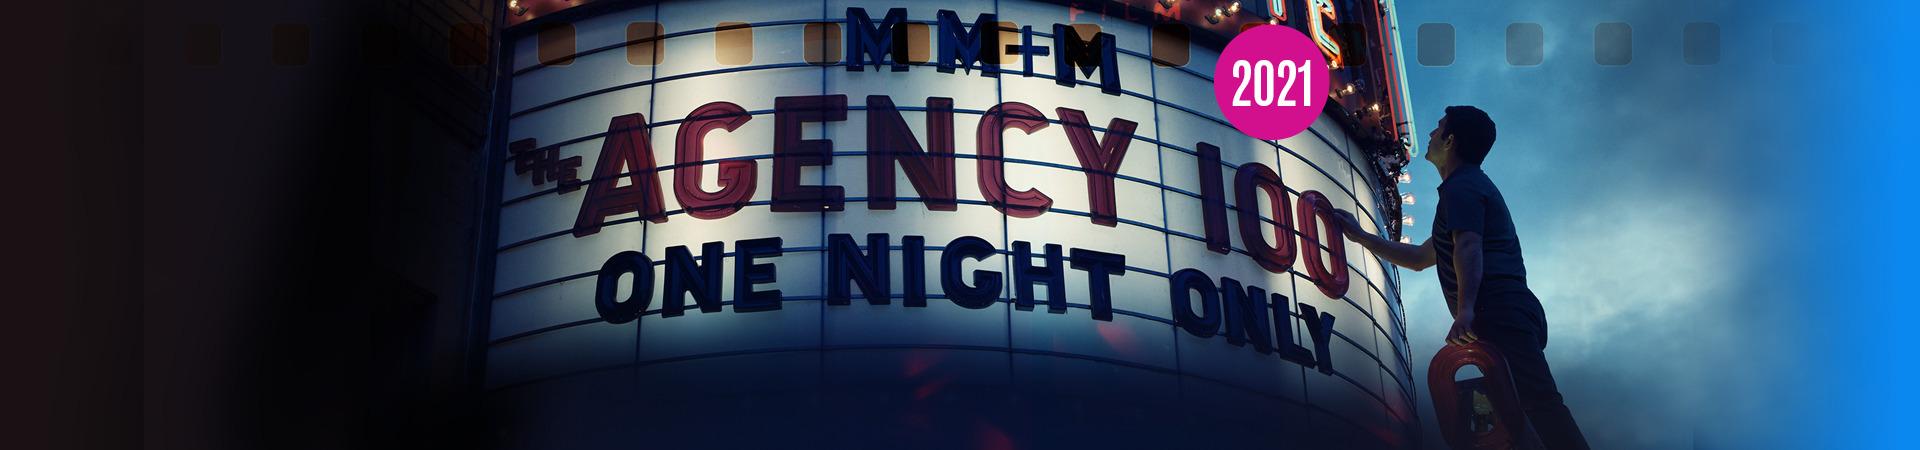 MM+M Agency100 2021 Banner